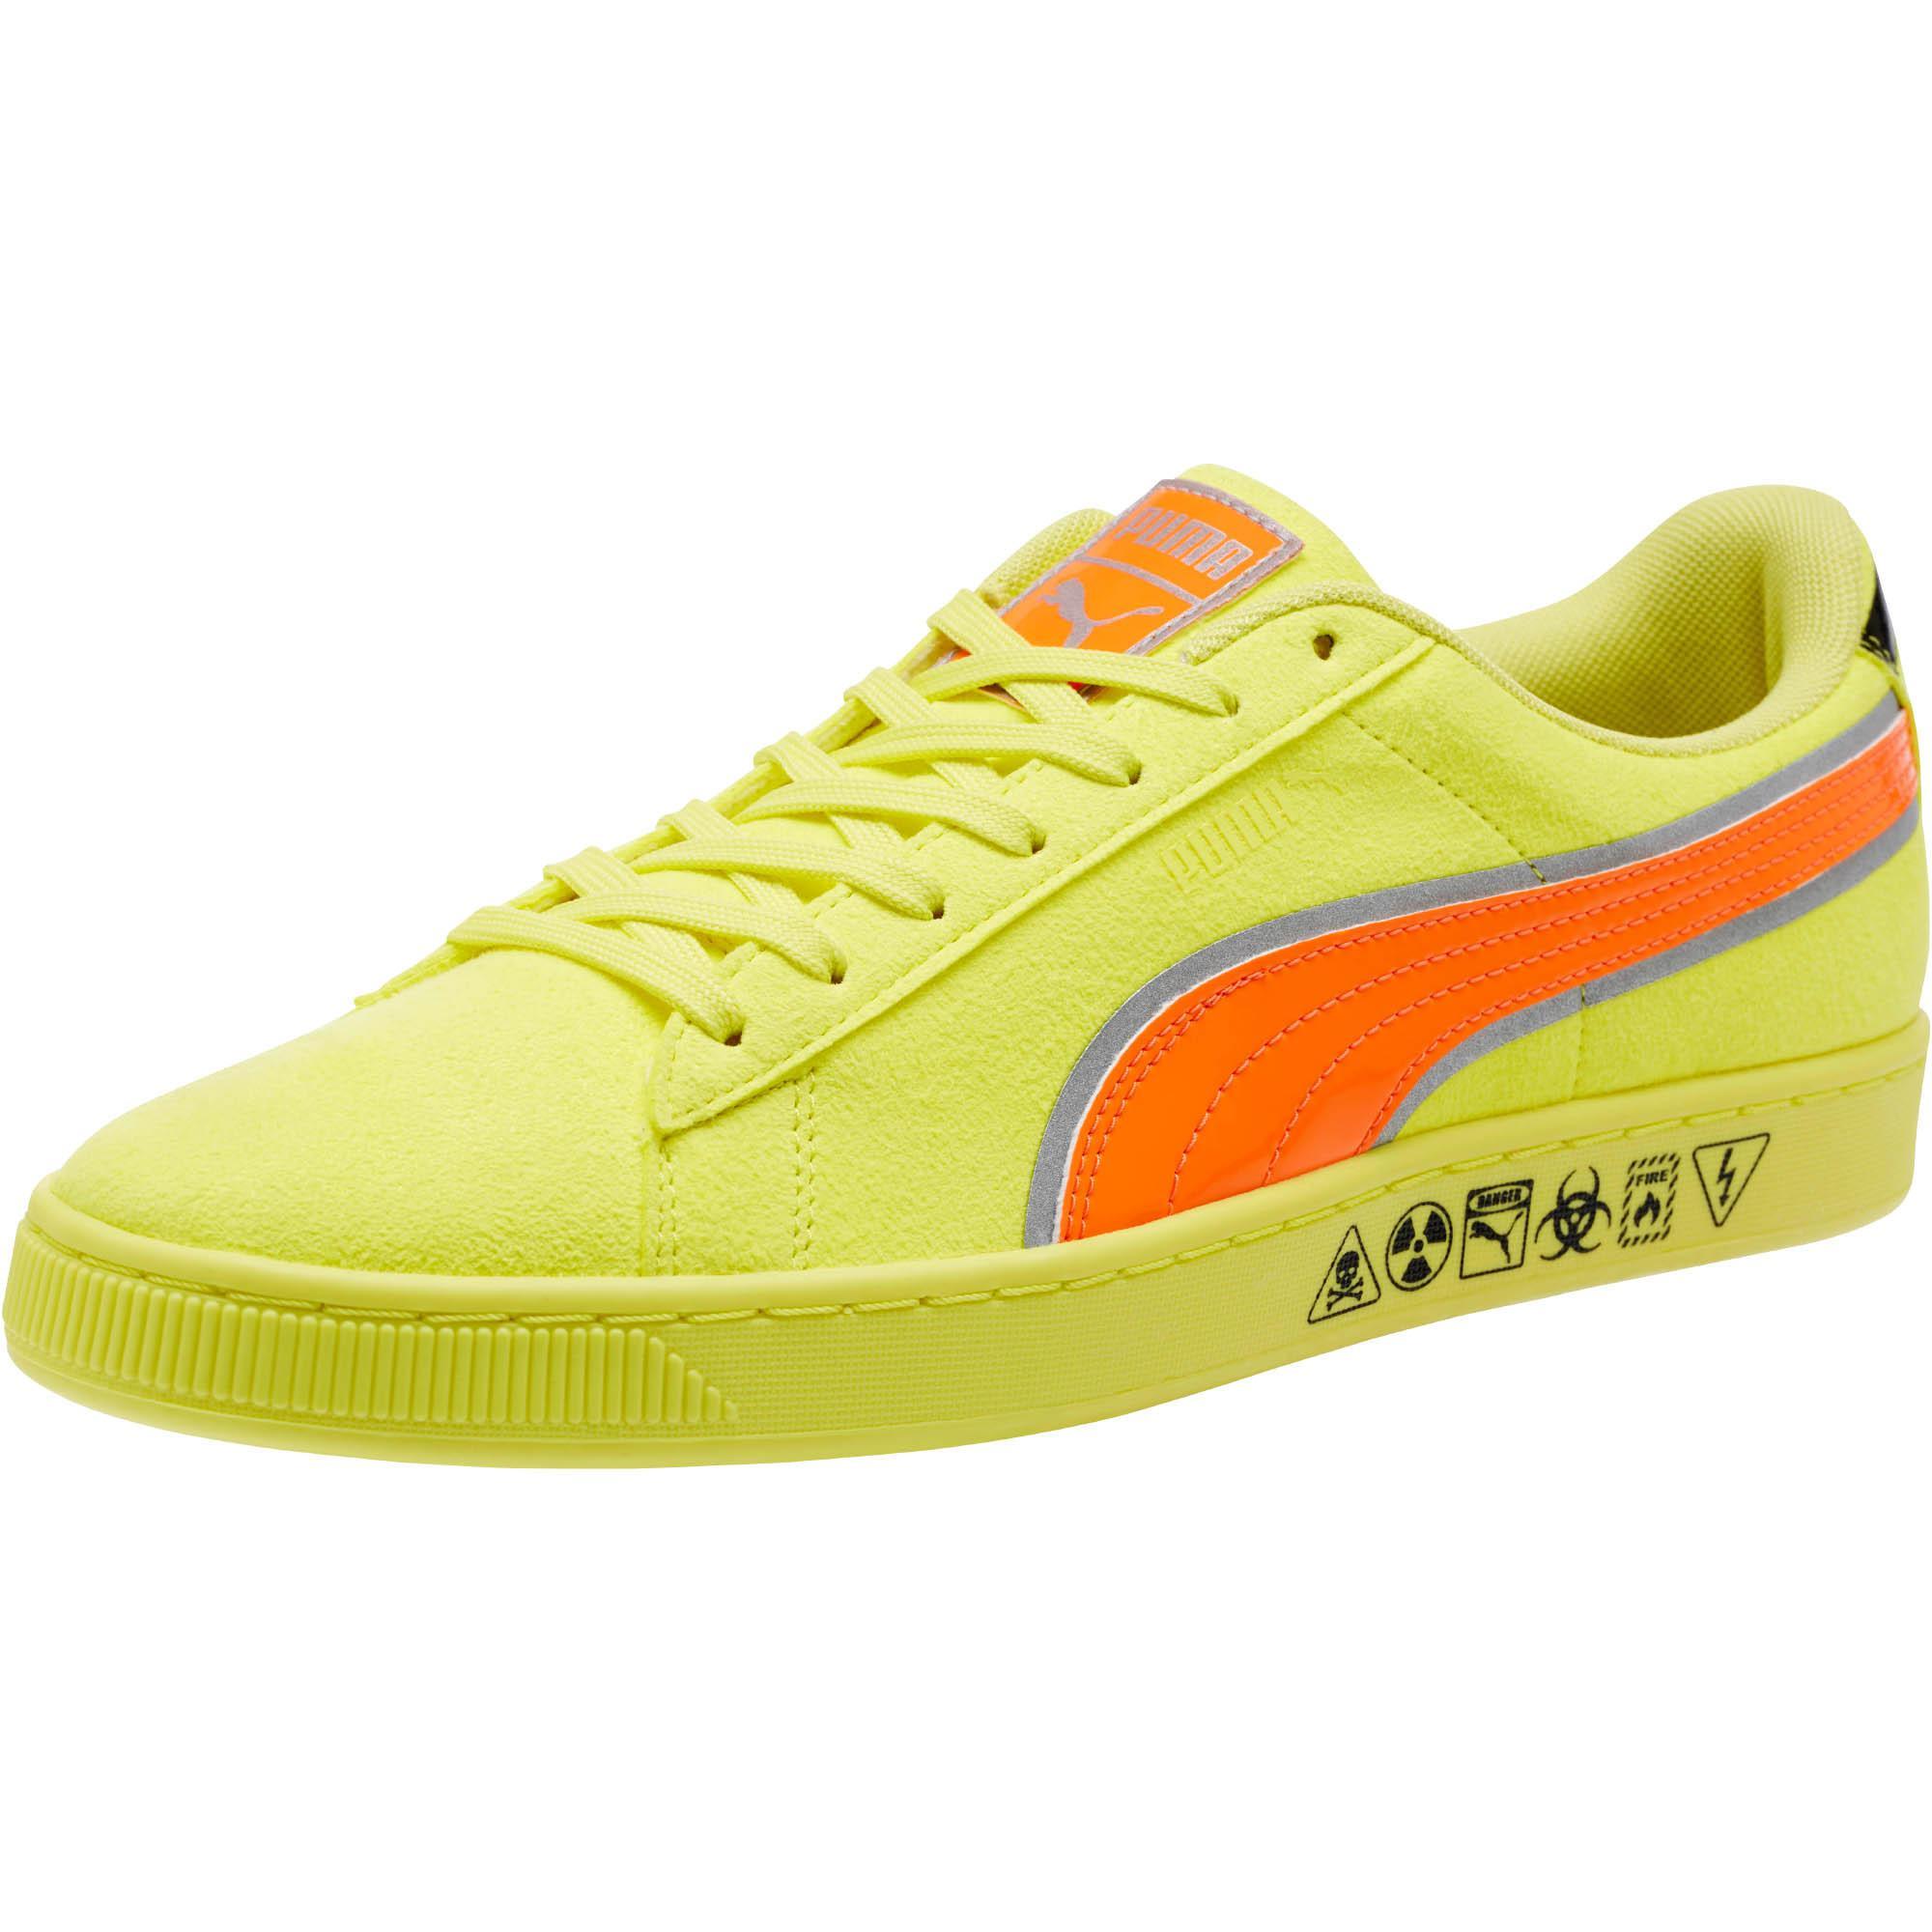 Lyst - PUMA Hazard Yellow Suede Sneakers in Yellow for Men 51476263feb